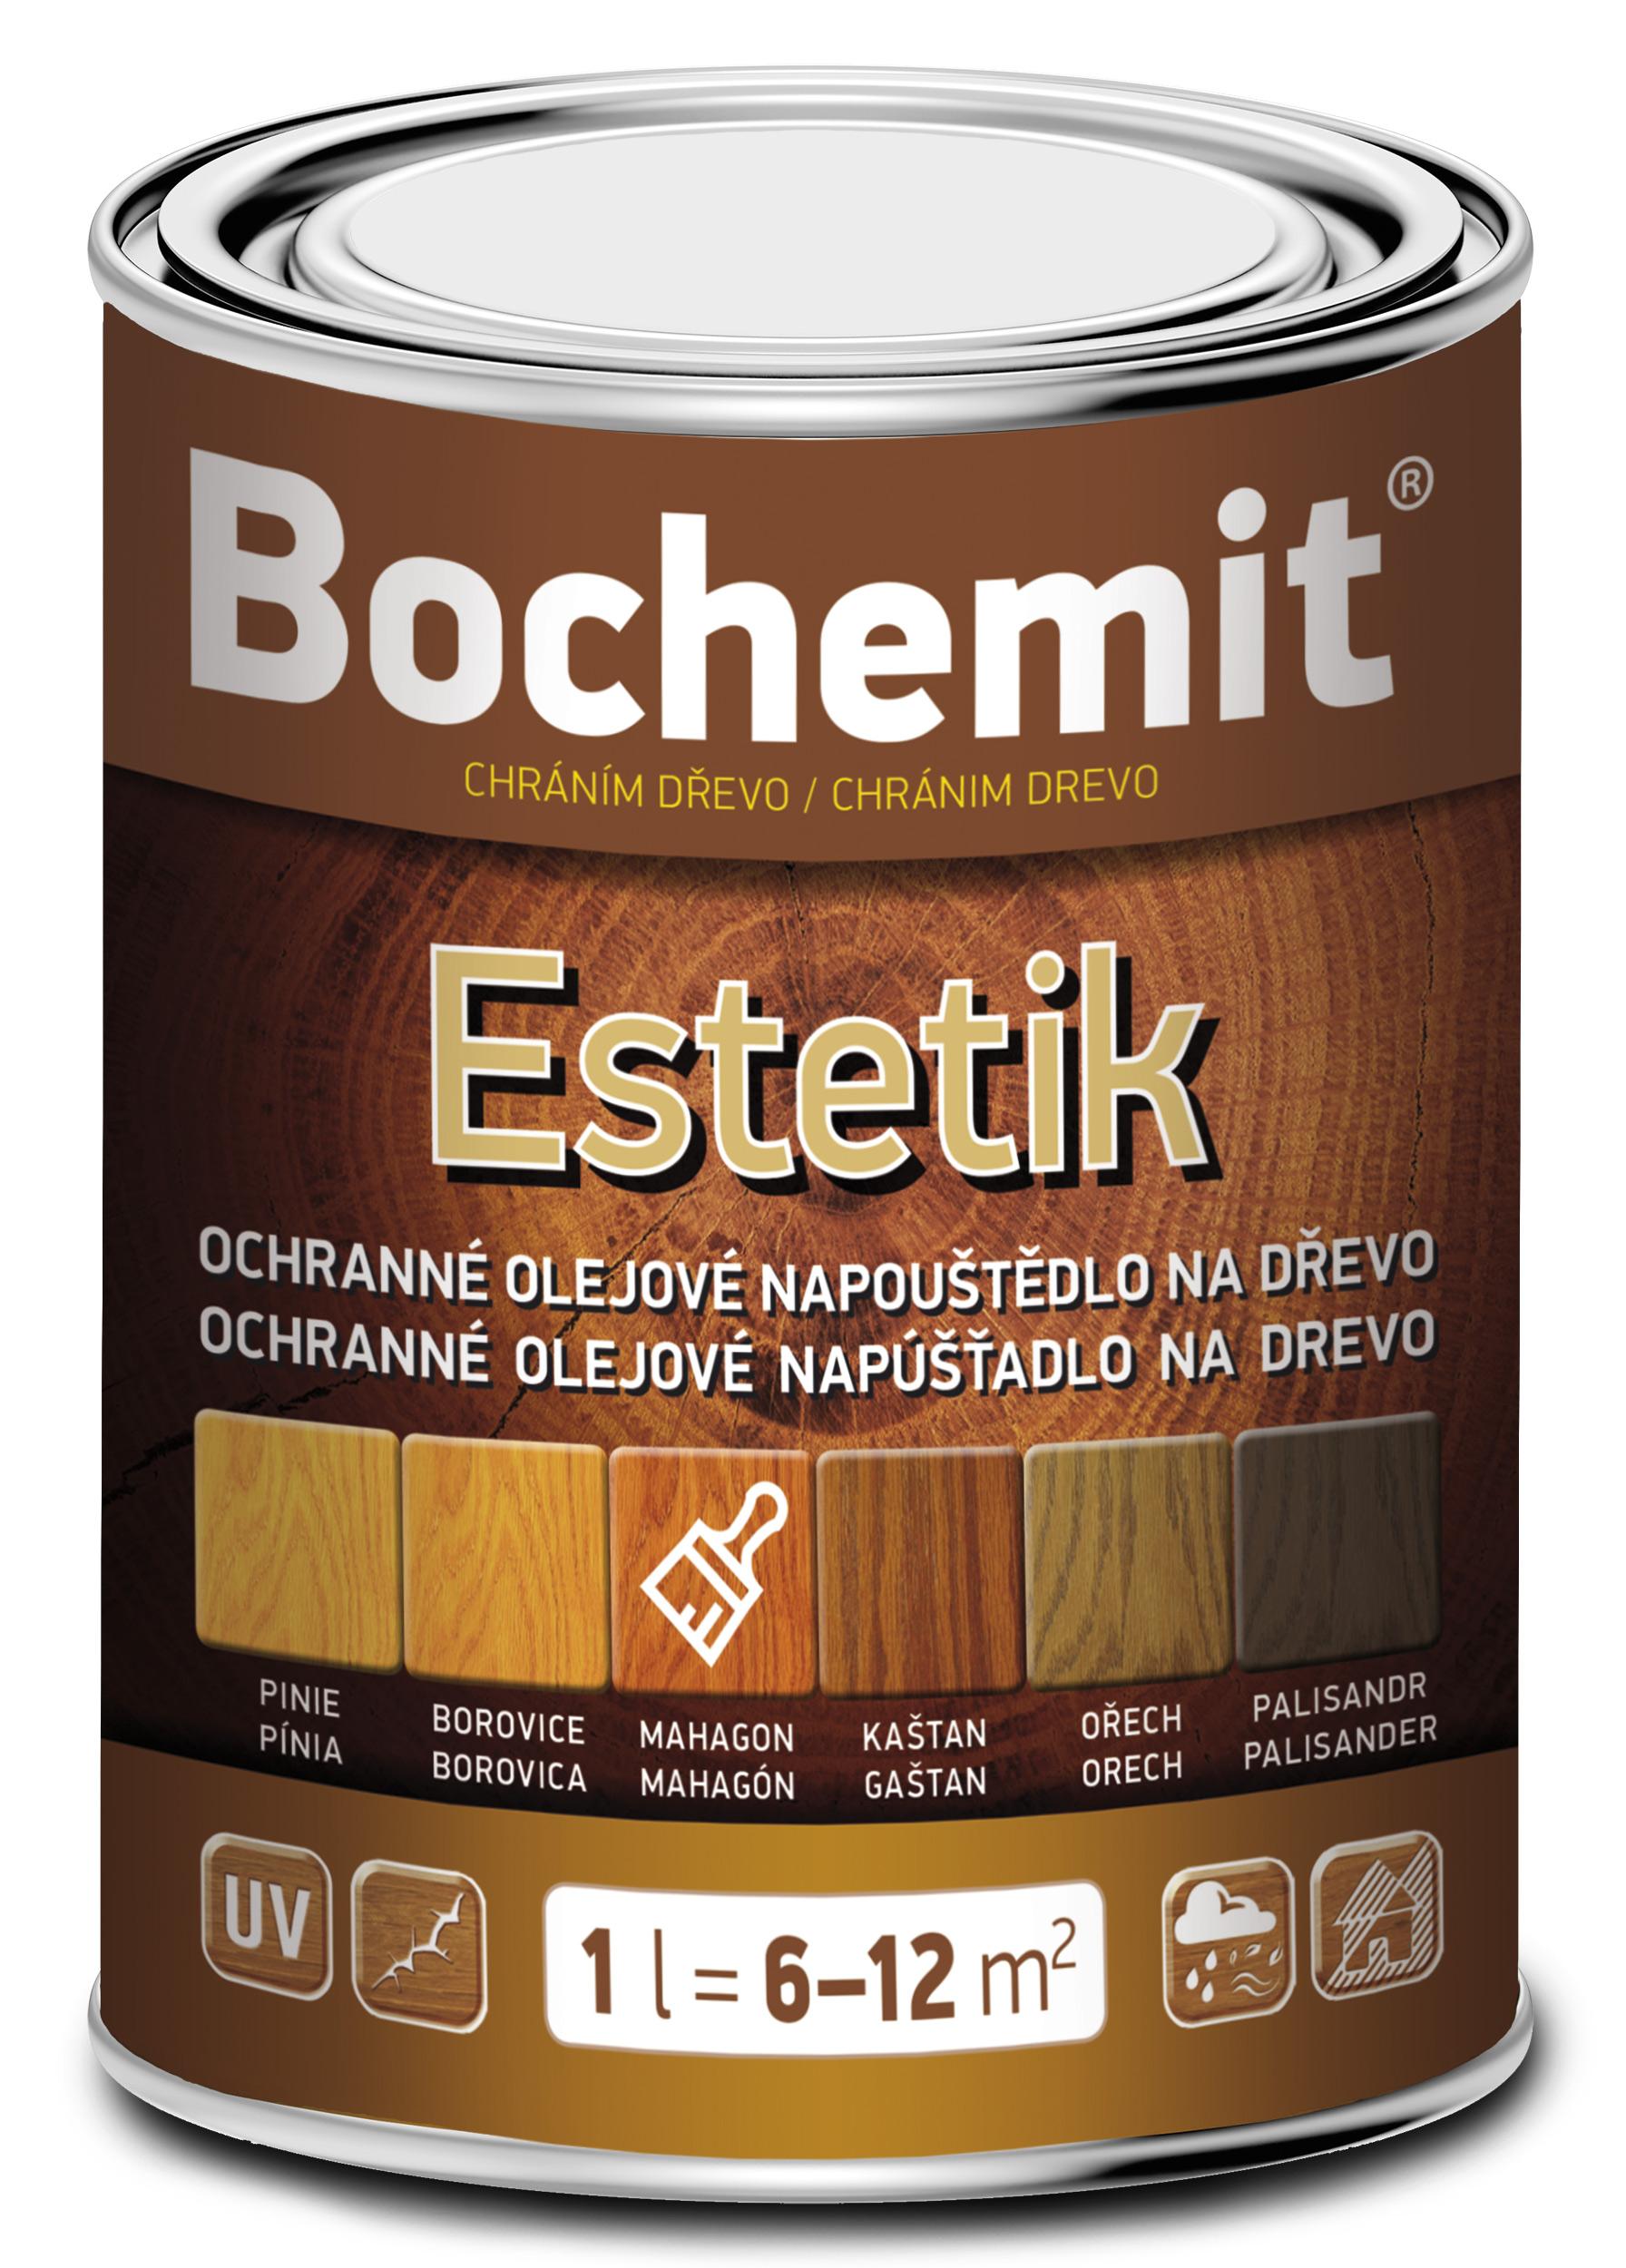 BOCHEMIT Estetik